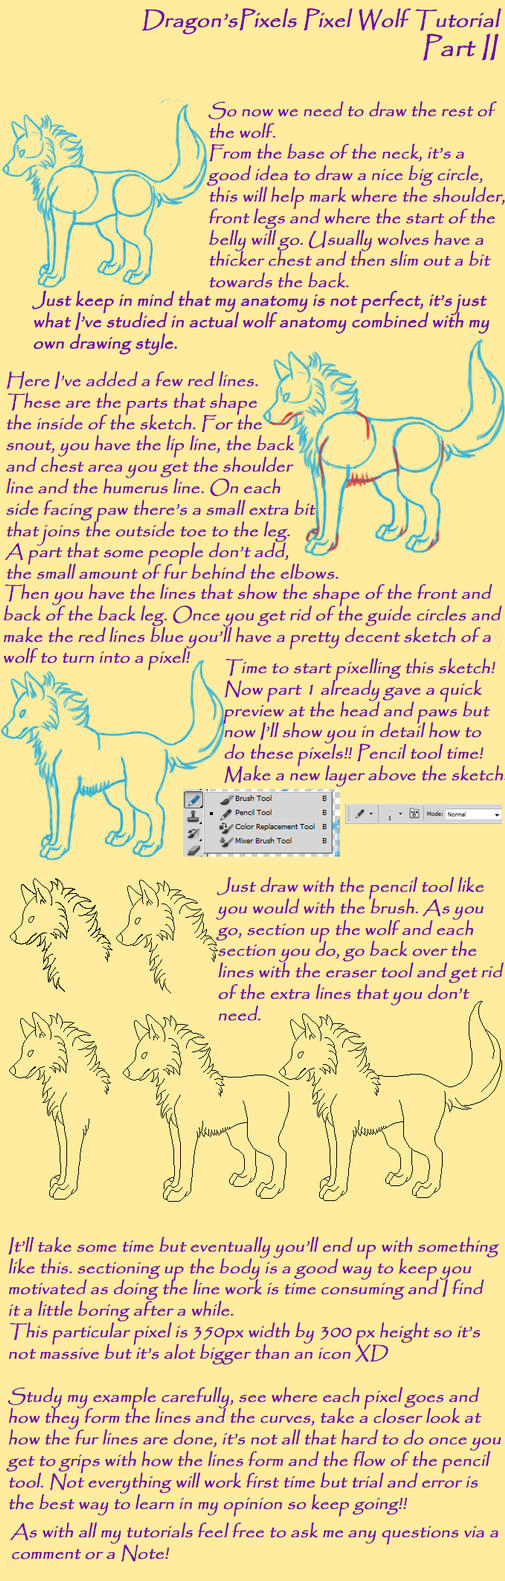 Dragon\'sPixels Pixel Wolf Tutorial Part 2 by DragonsPixels on DeviantArt